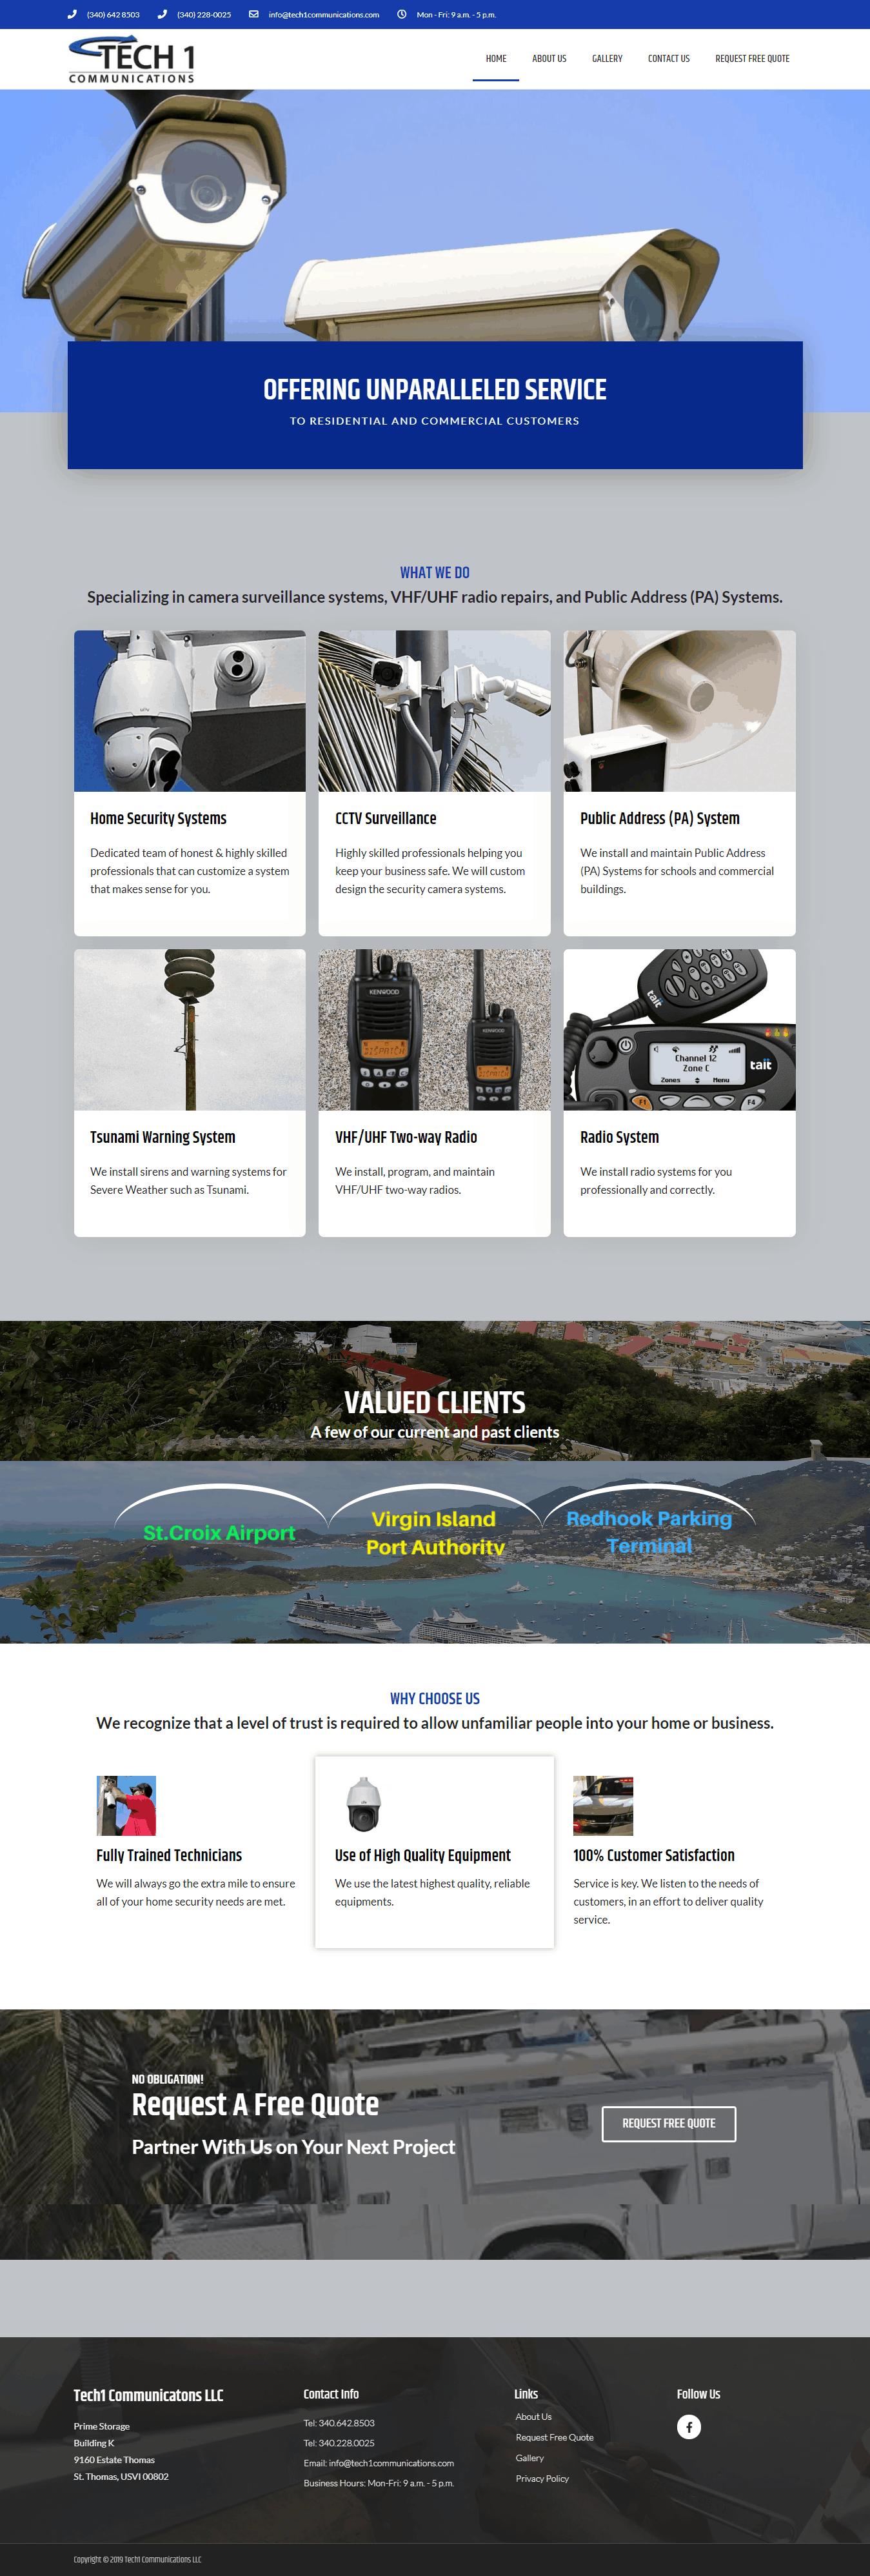 Project Tech1 Communications